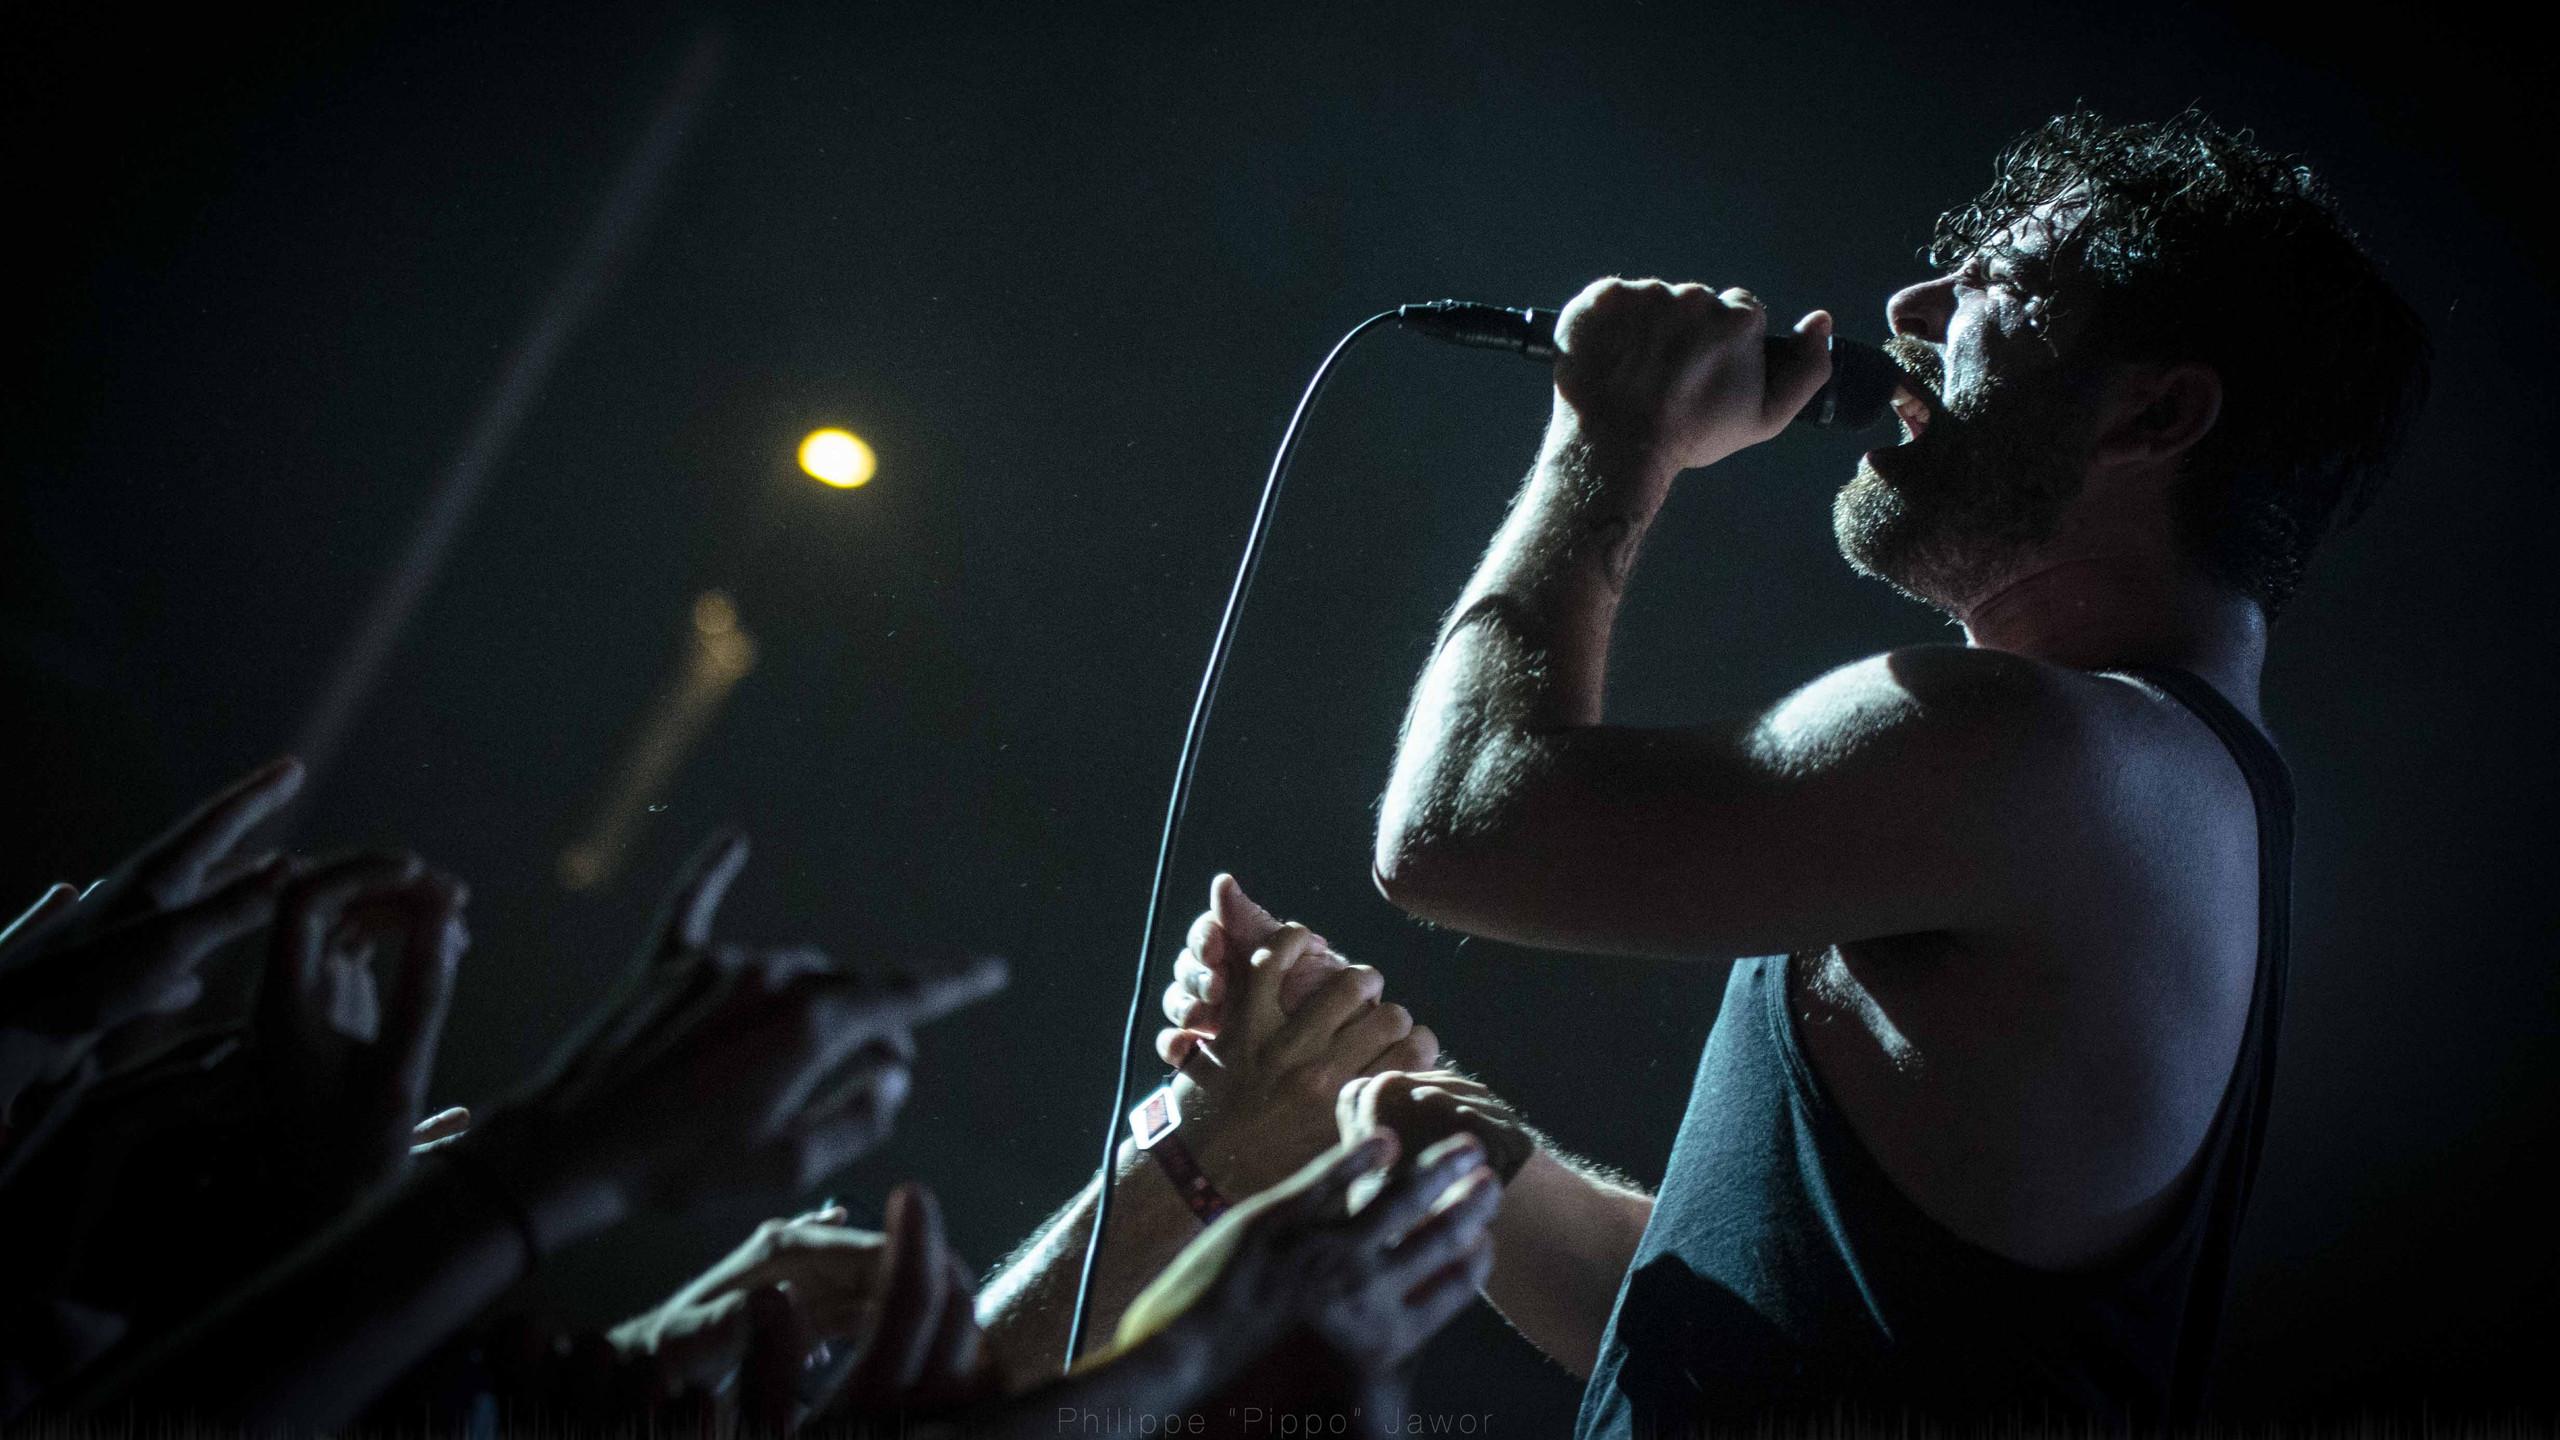 Yannis Philippakis, lead singer of the British rock band Foals, at Rock en Seine festival, August 2016.